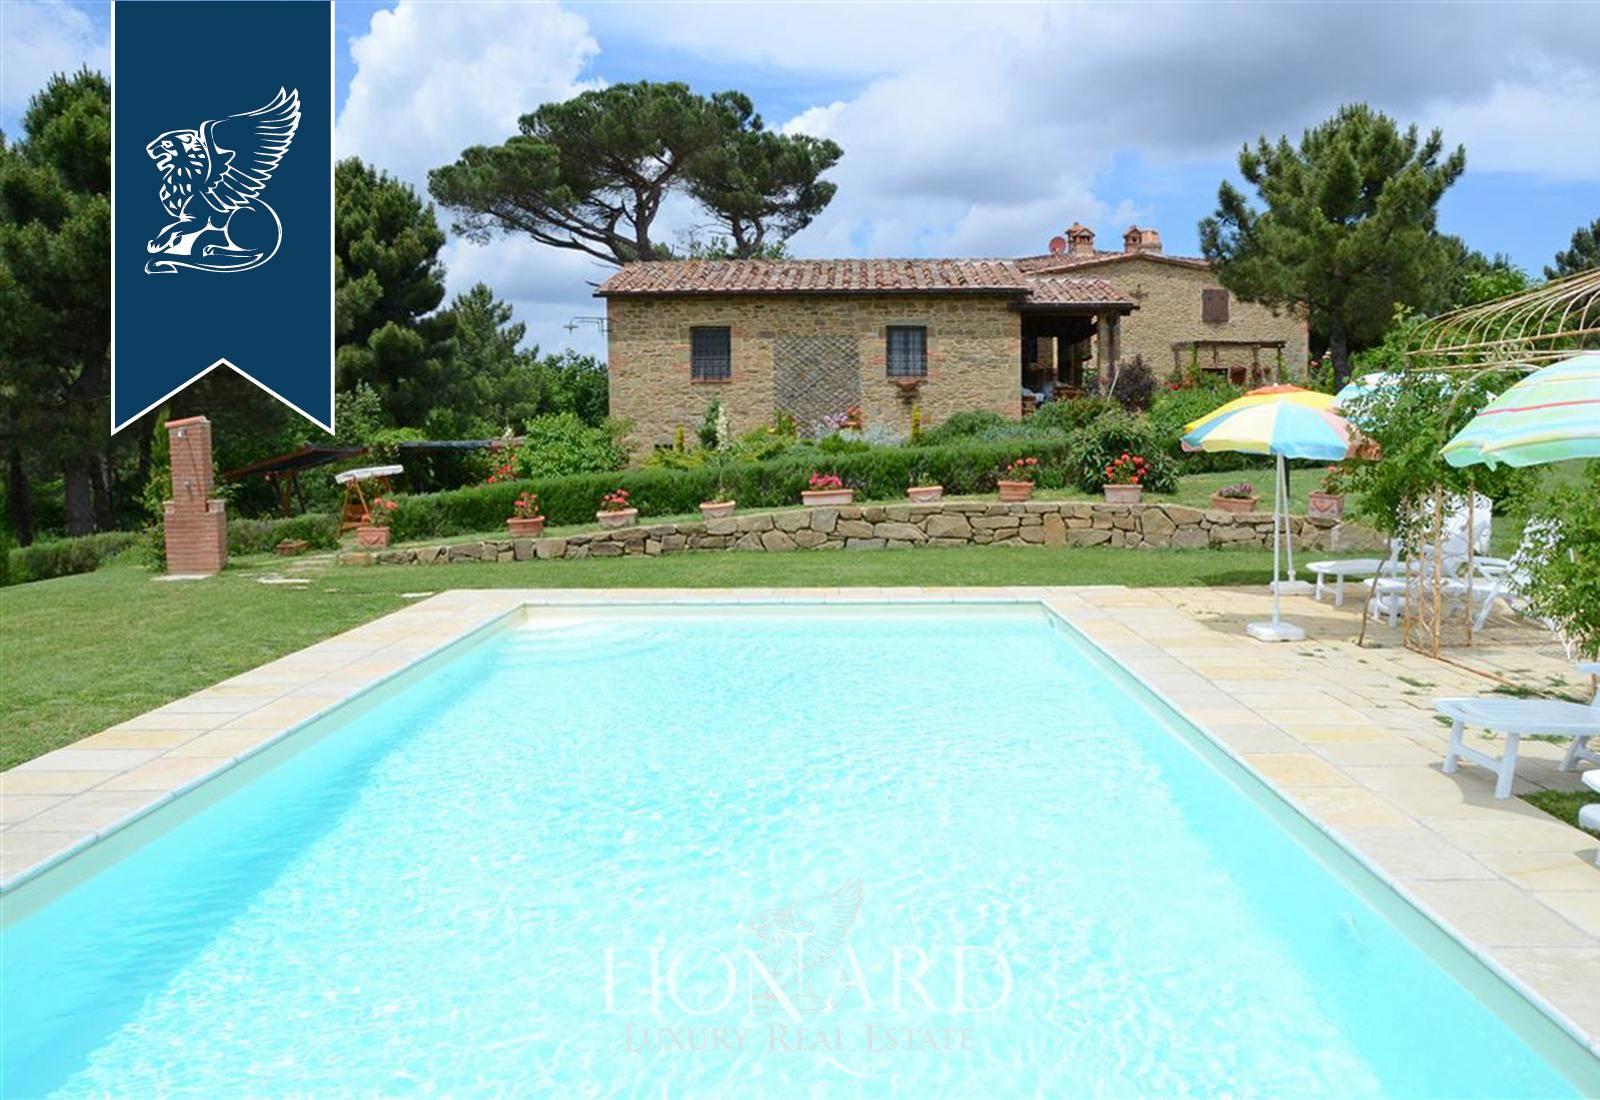 Villa in Vendita a Gaiole In Chianti: 0 locali, 485 mq - Foto 6